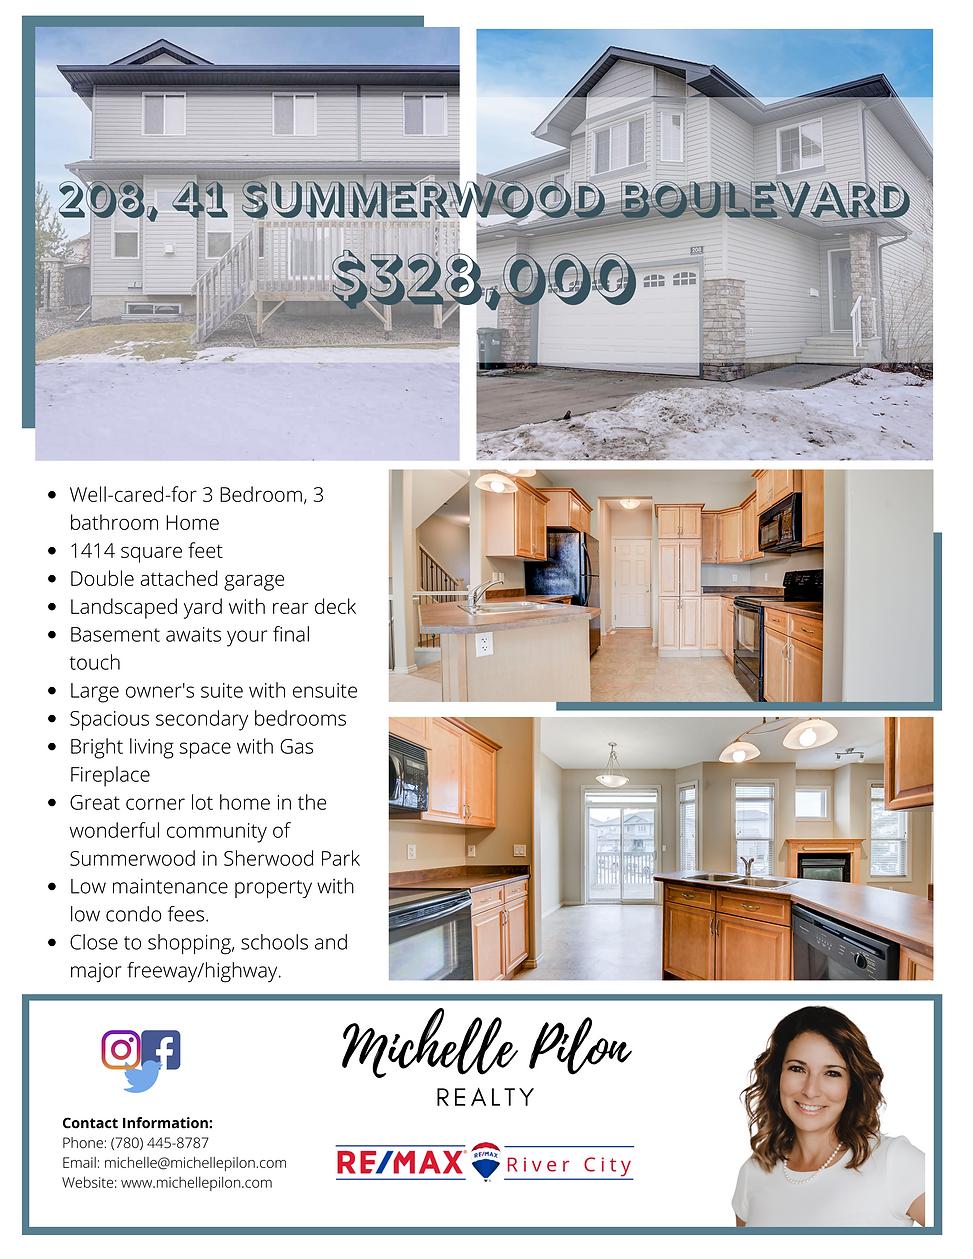 208, 41 Summerwood Boulevard Feature She